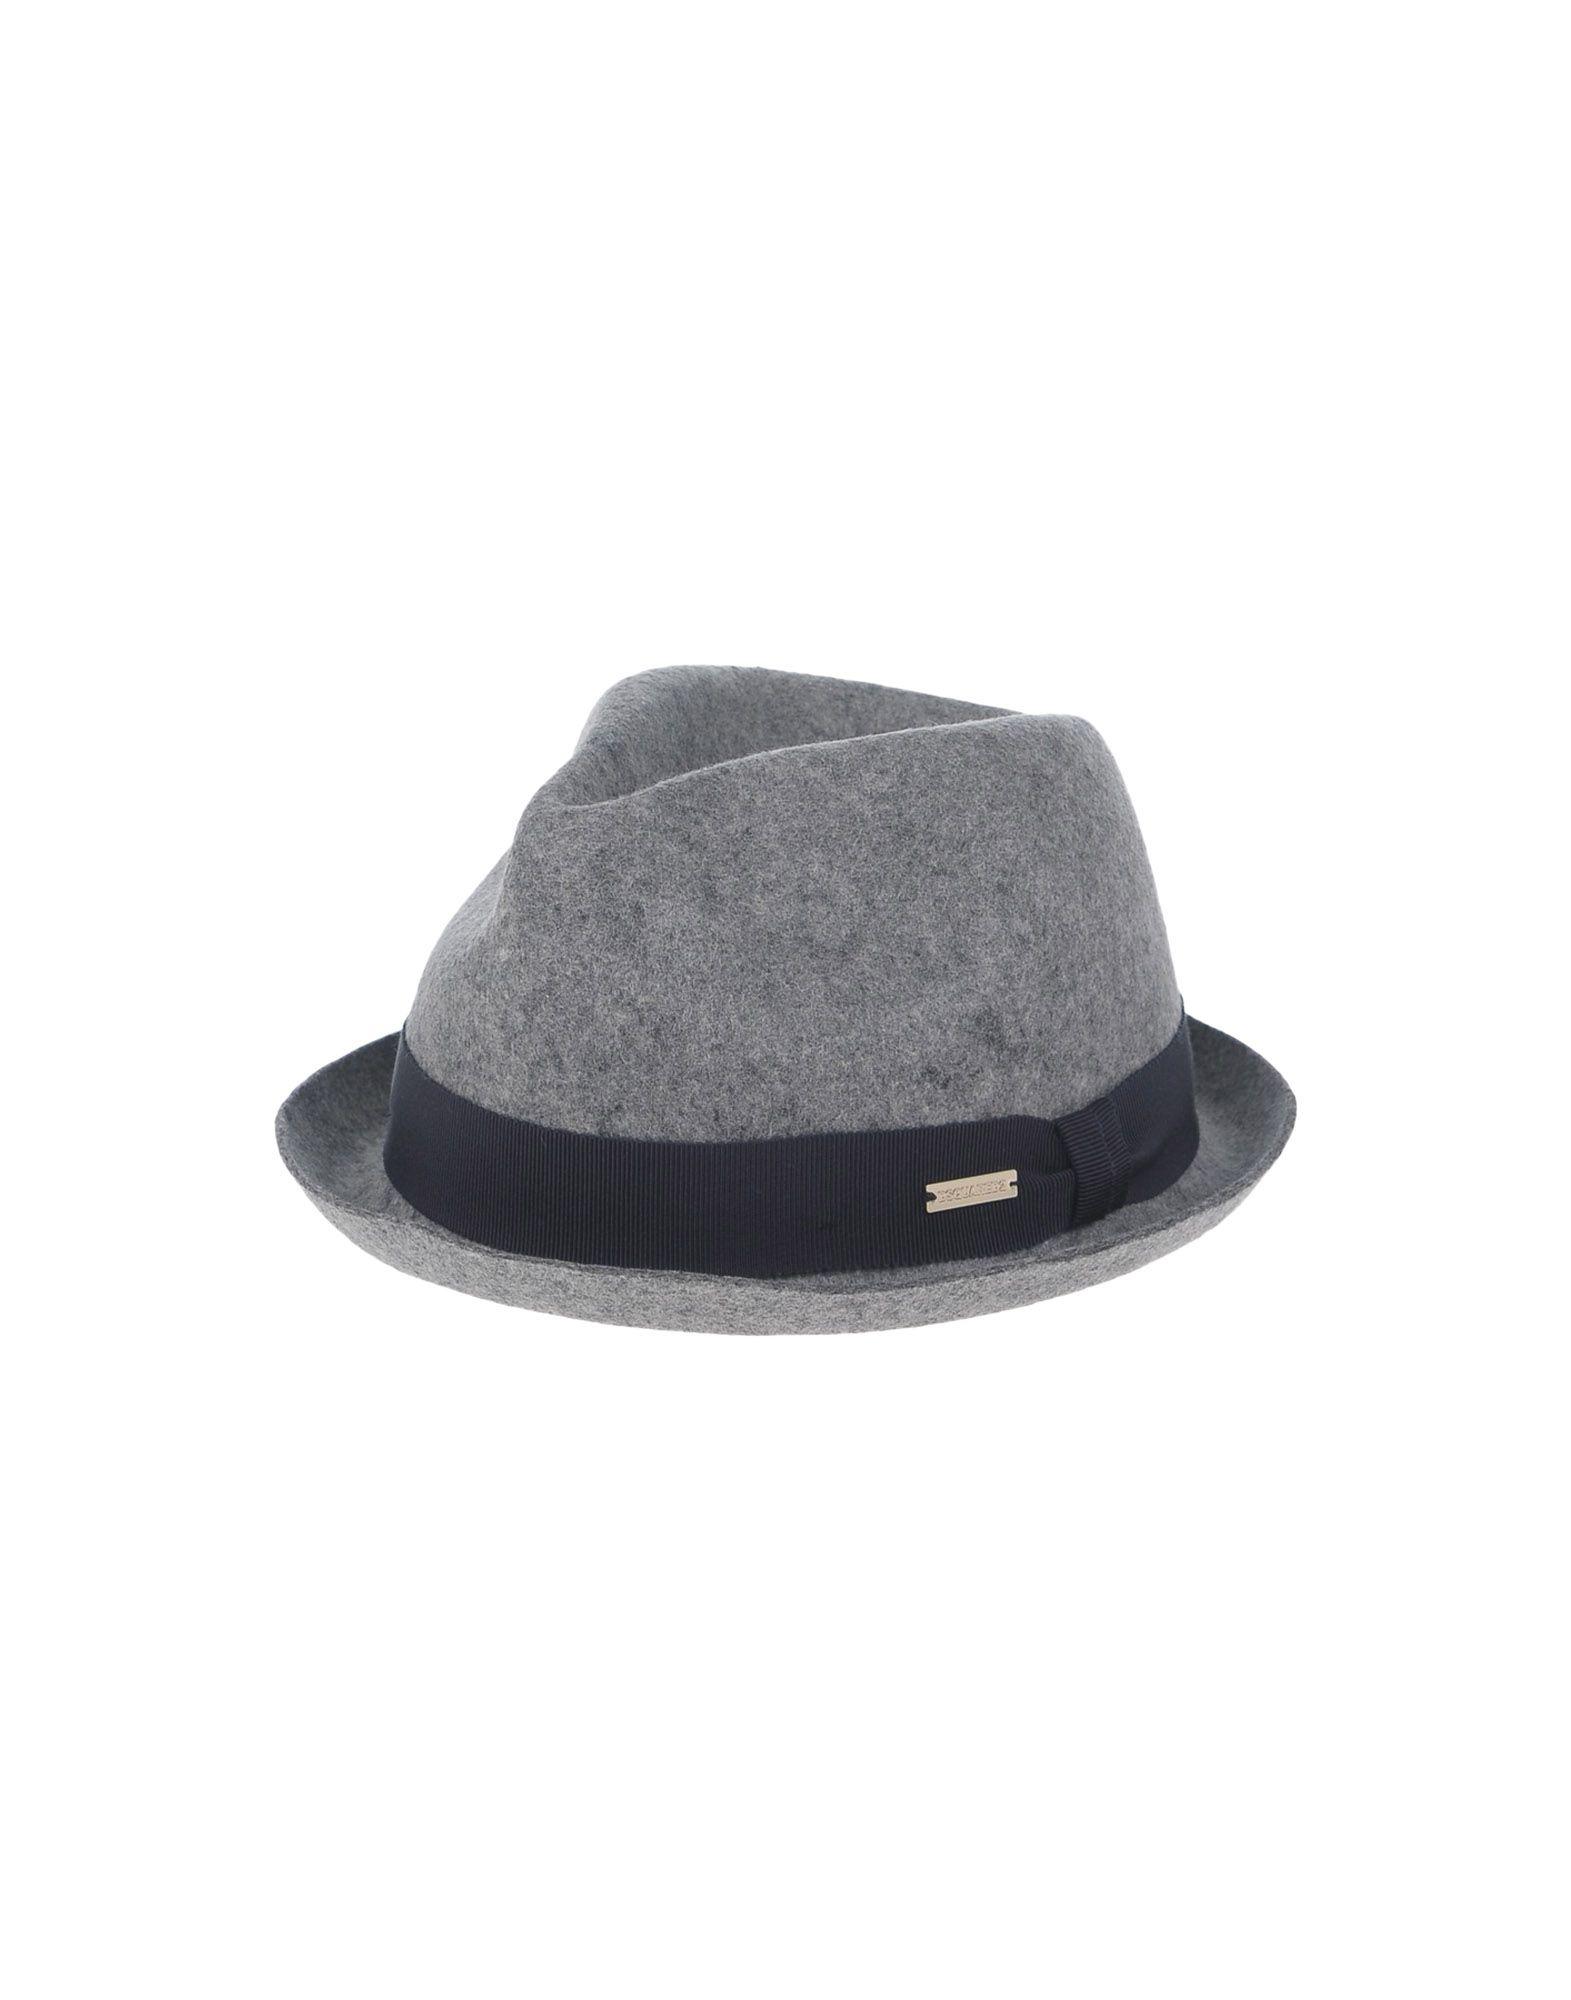 663e5d89f92 Dsquared2 Hat - Men Dsquared2 Hats online on YOOX Latvia - 46531610QN